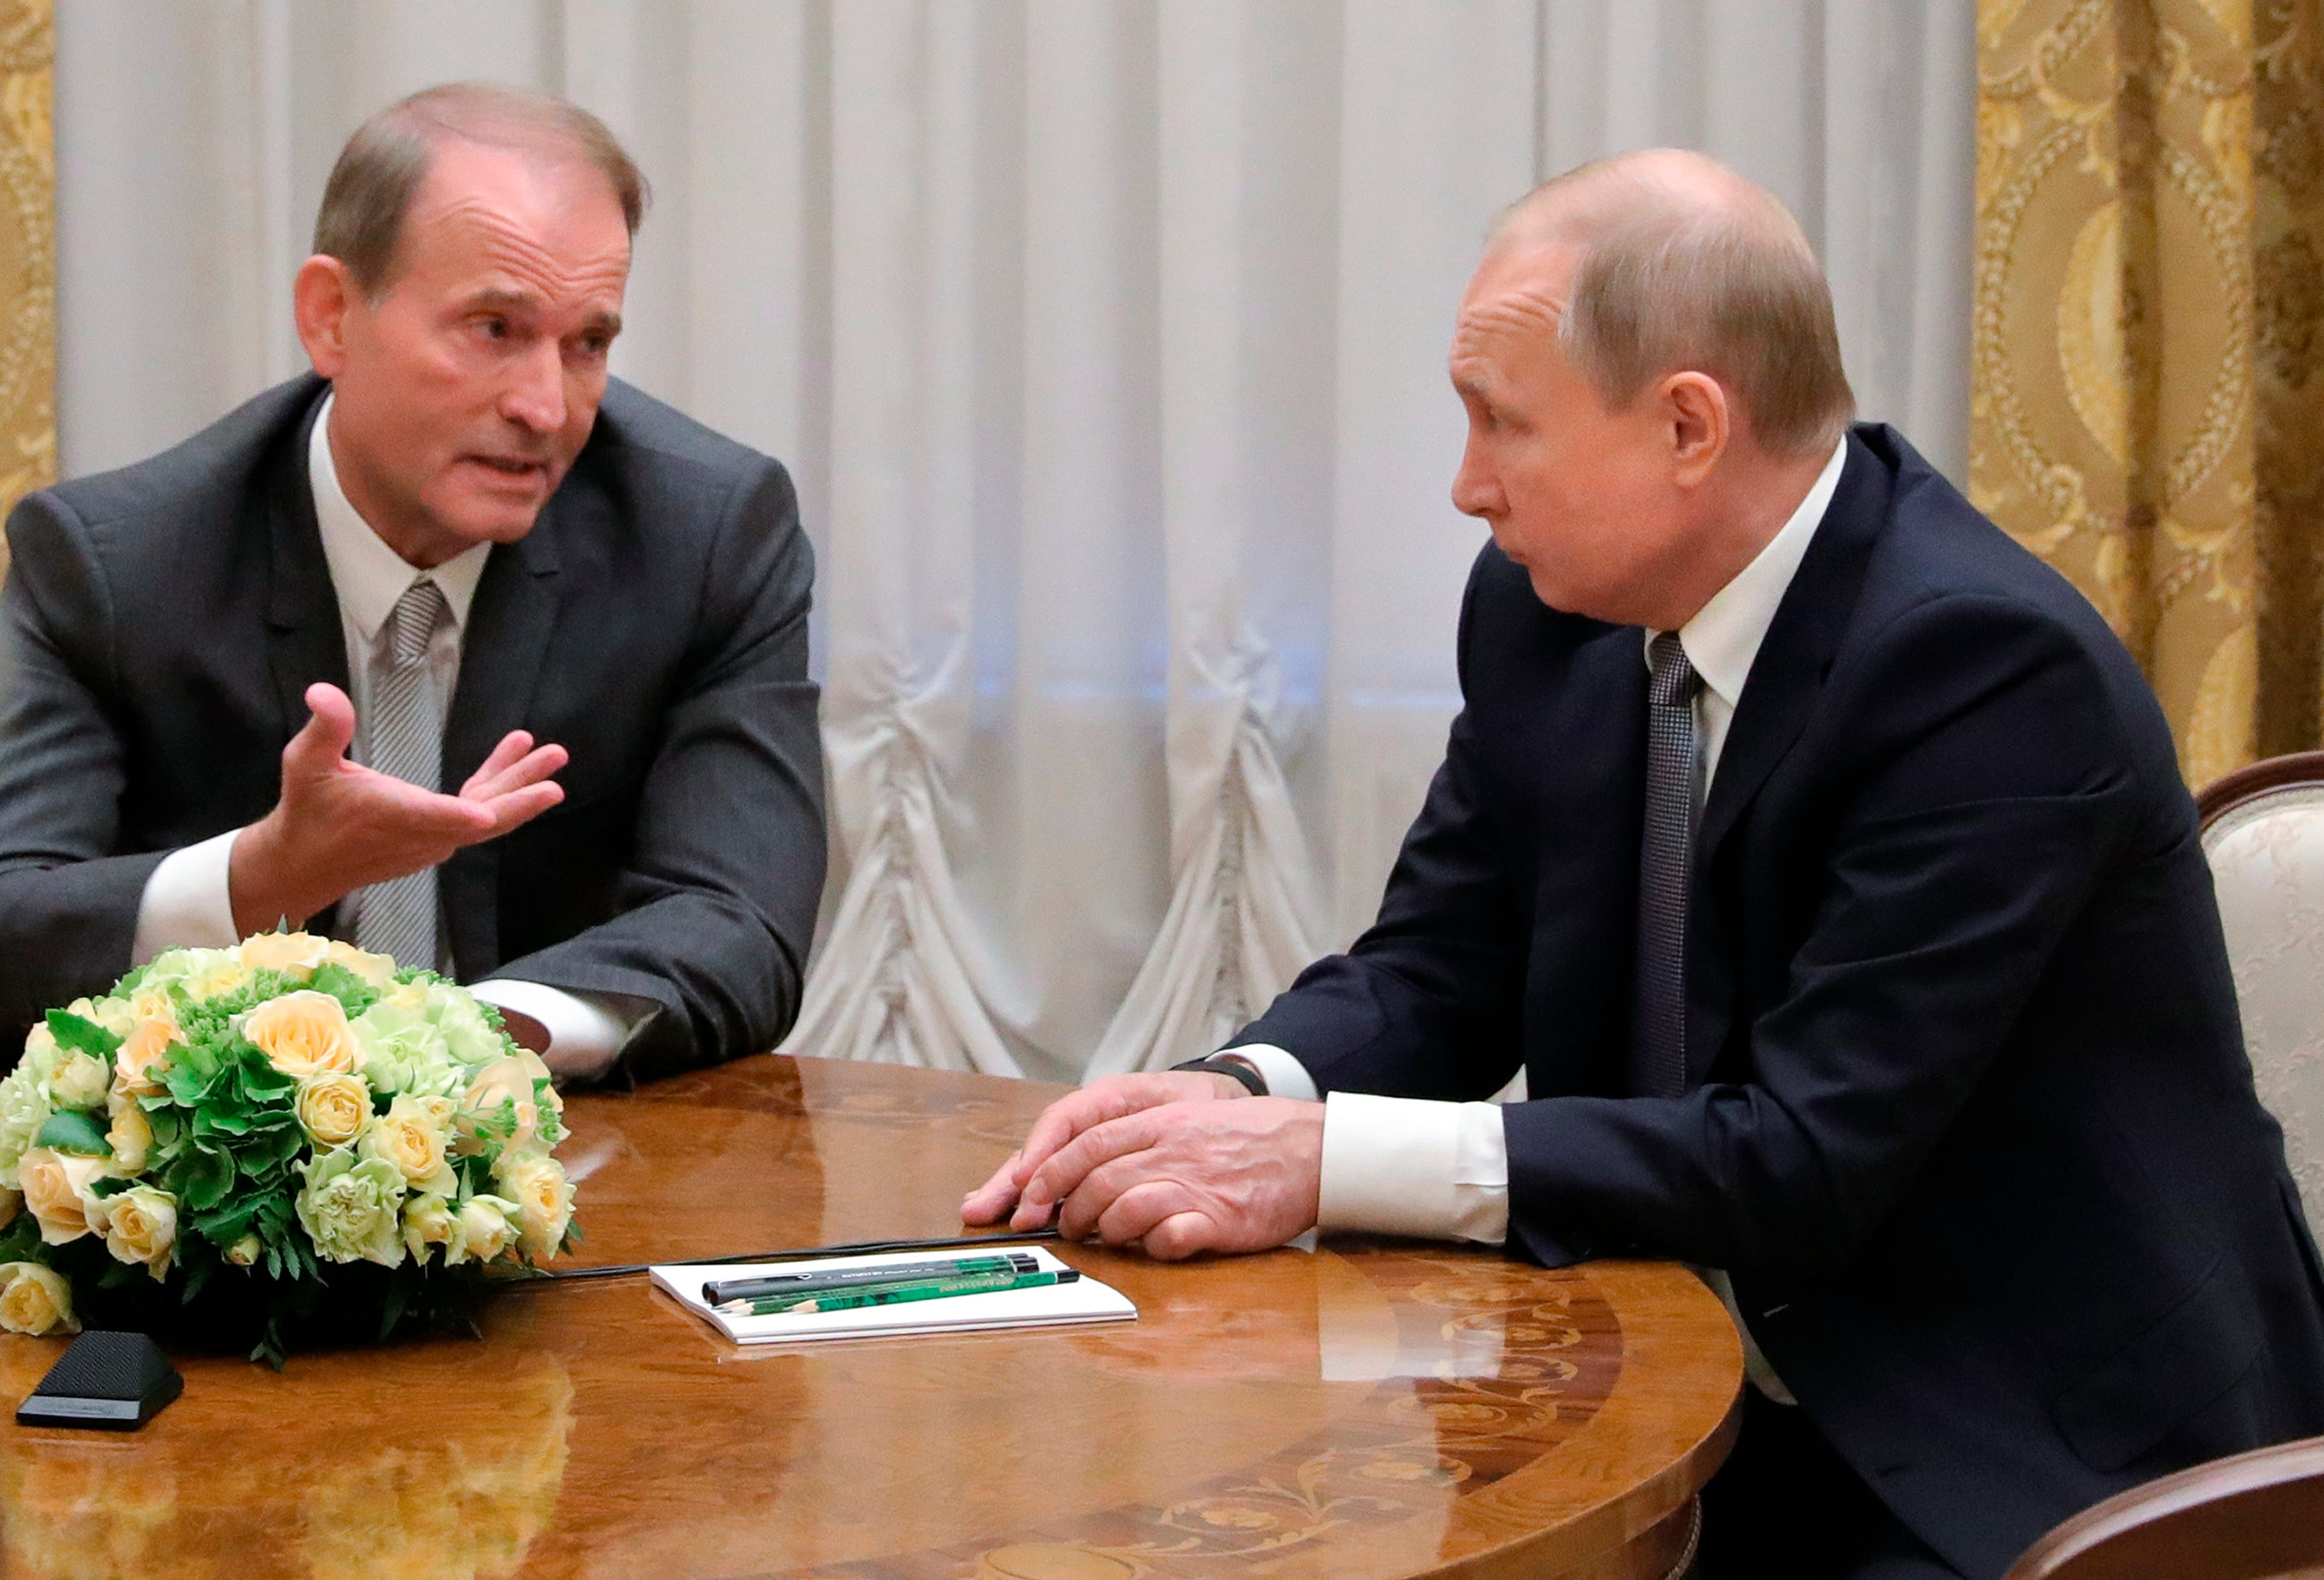 Ukraine charges Putin ally Medvedchuk with treason 2